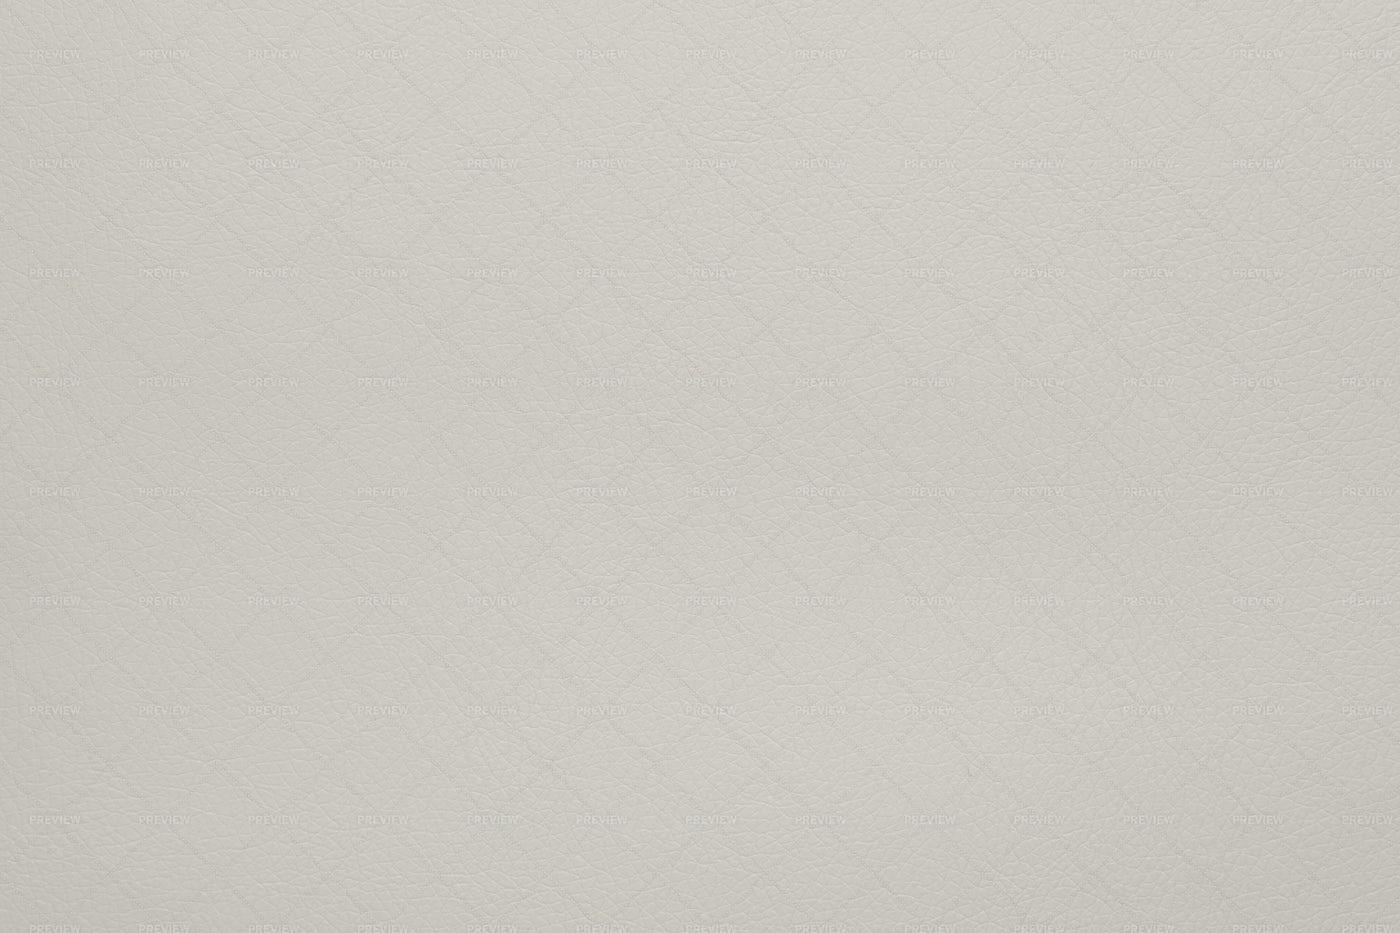 White Leather Background: Stock Photos